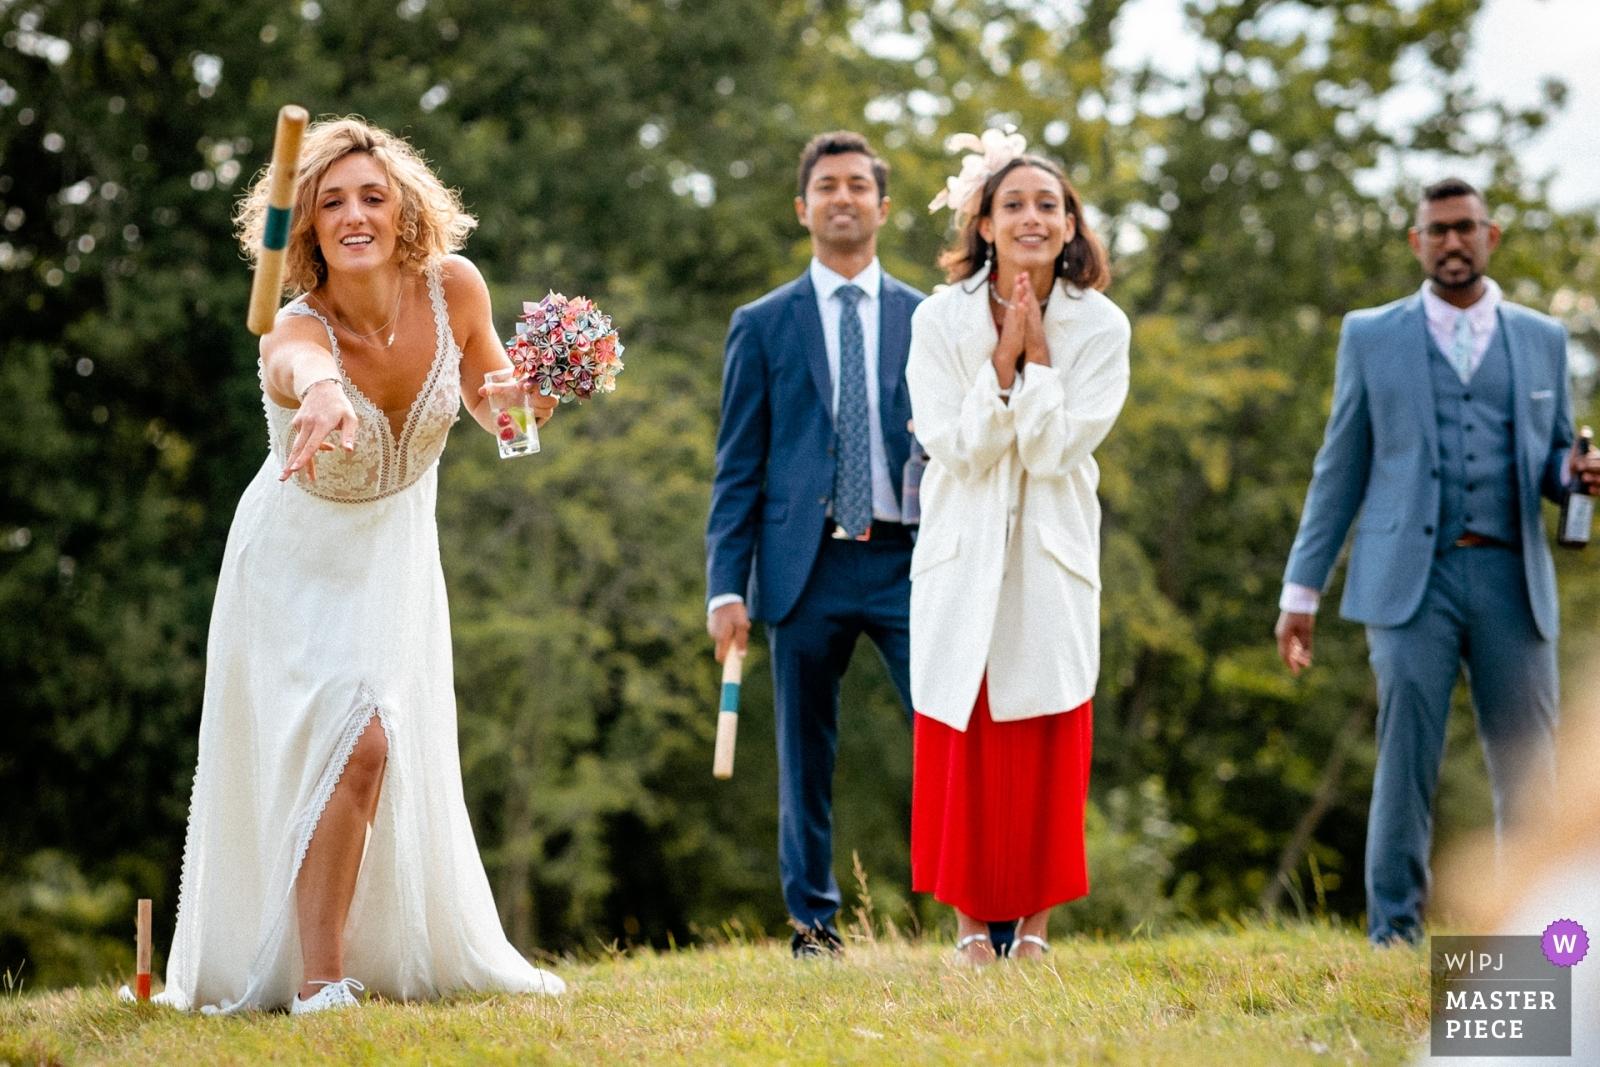 Bride playing garden games - Hertfordshire, England Wedding Photography -  | Swallows Oast, UK